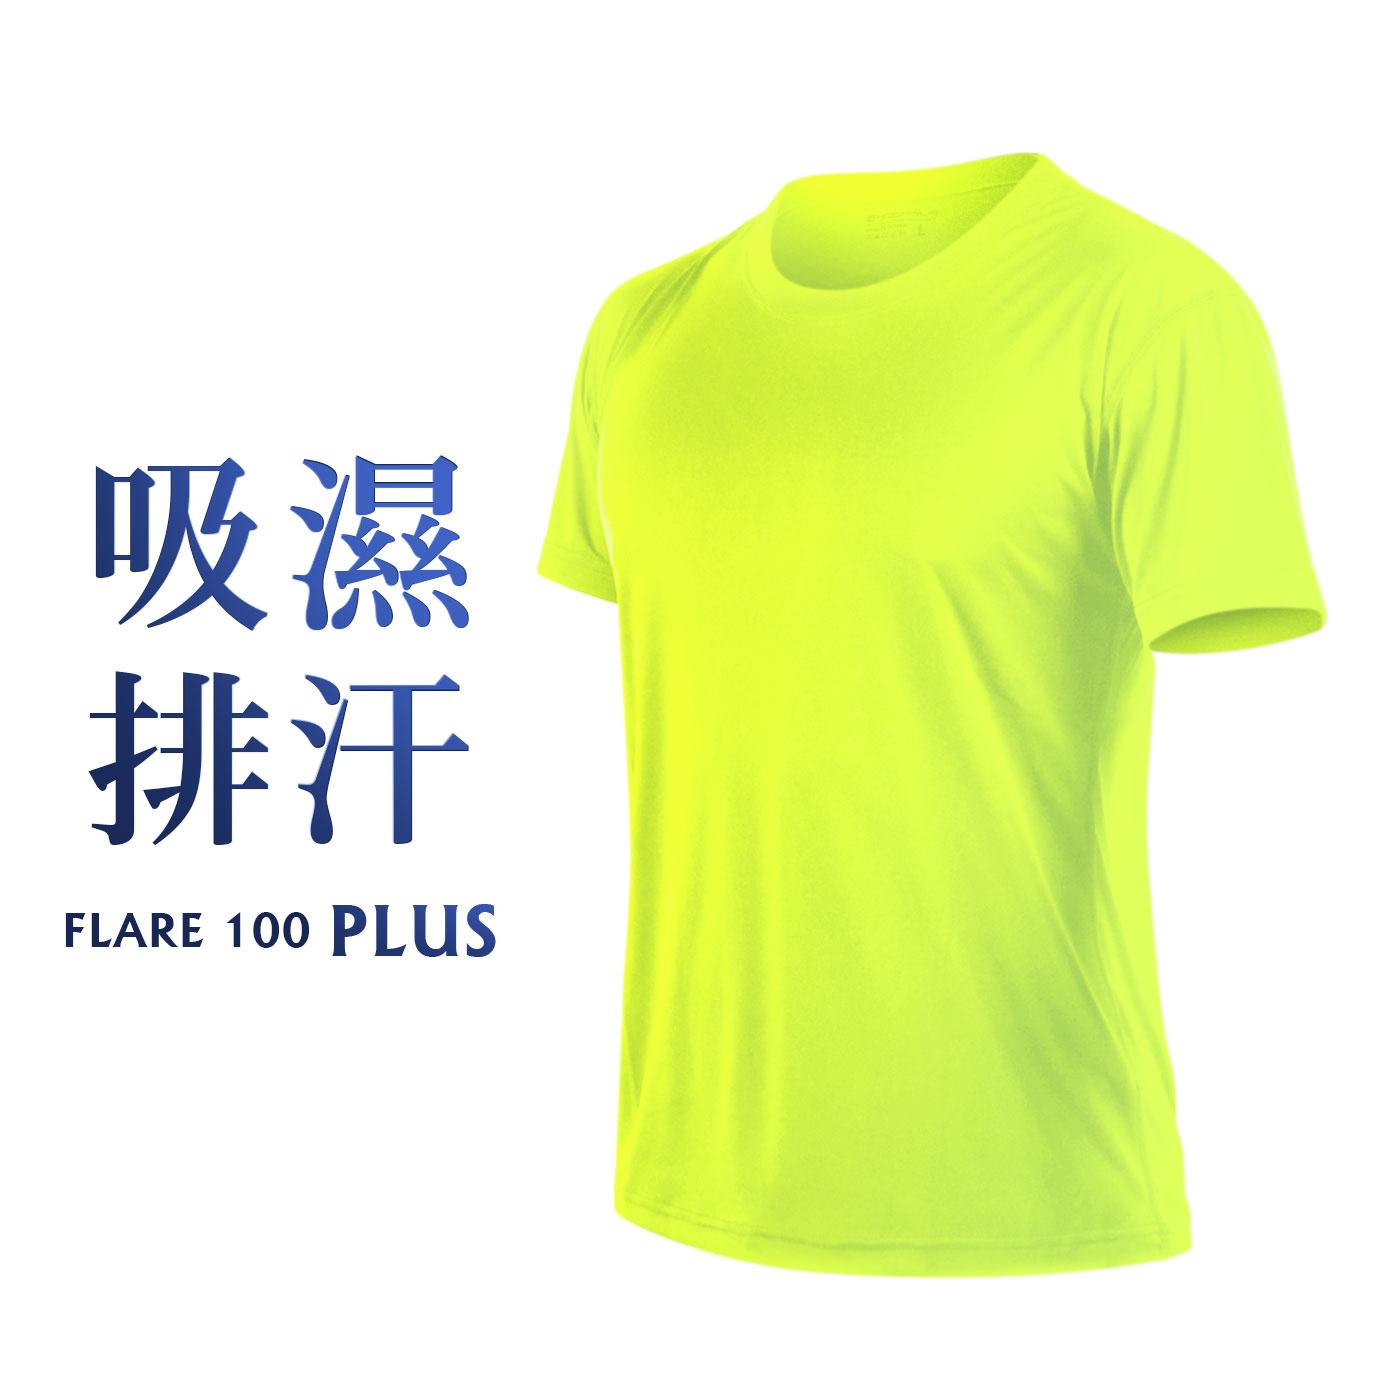 HODARLA FLARE 100 PLUS 吸濕排汗衫 3153701 - 螢光黃